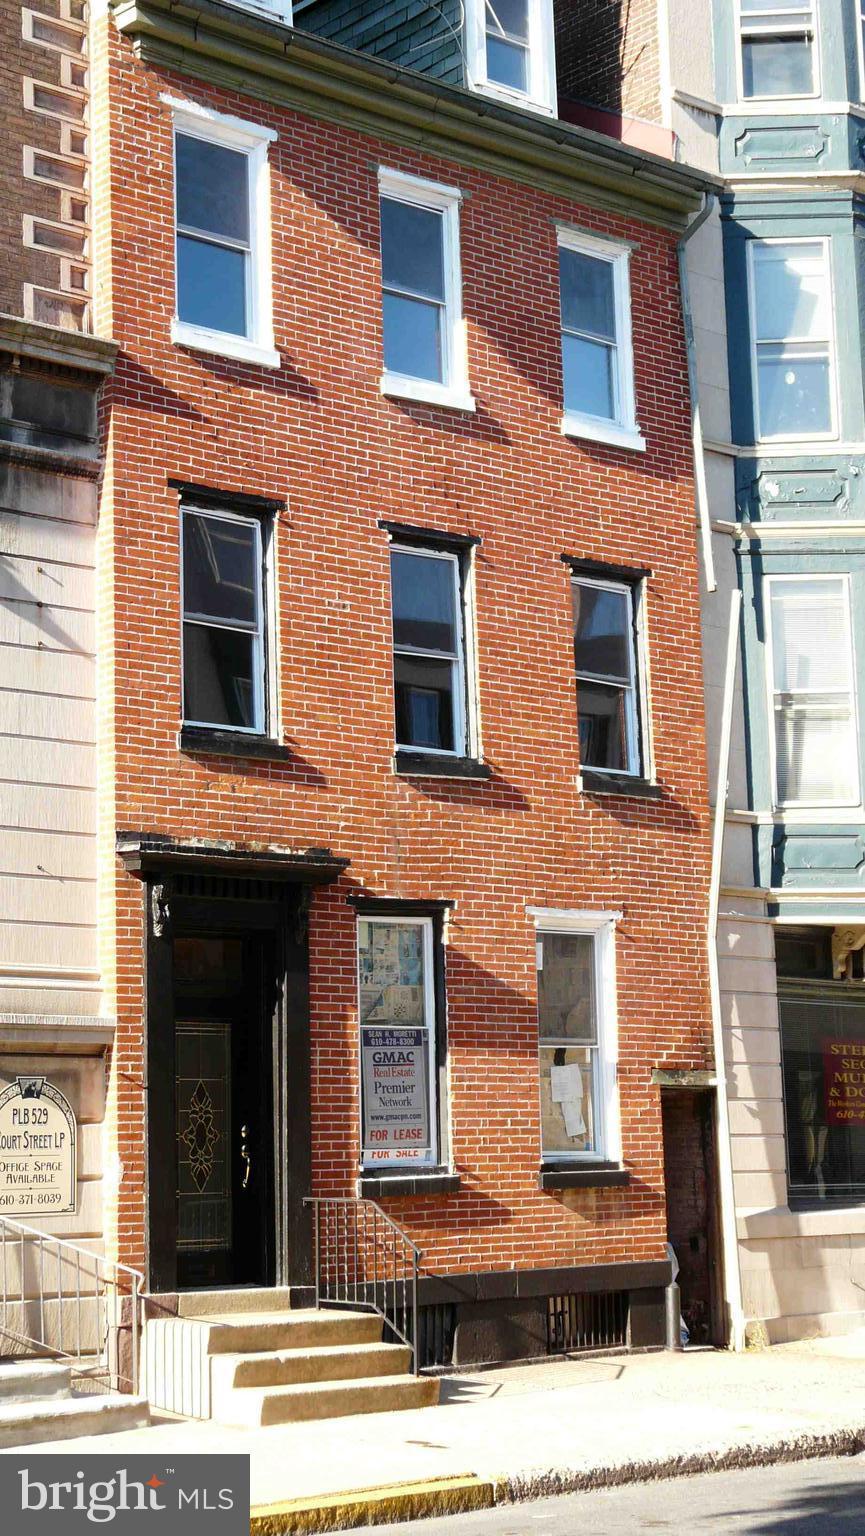 531 COURT STREET, READING, PA 19601